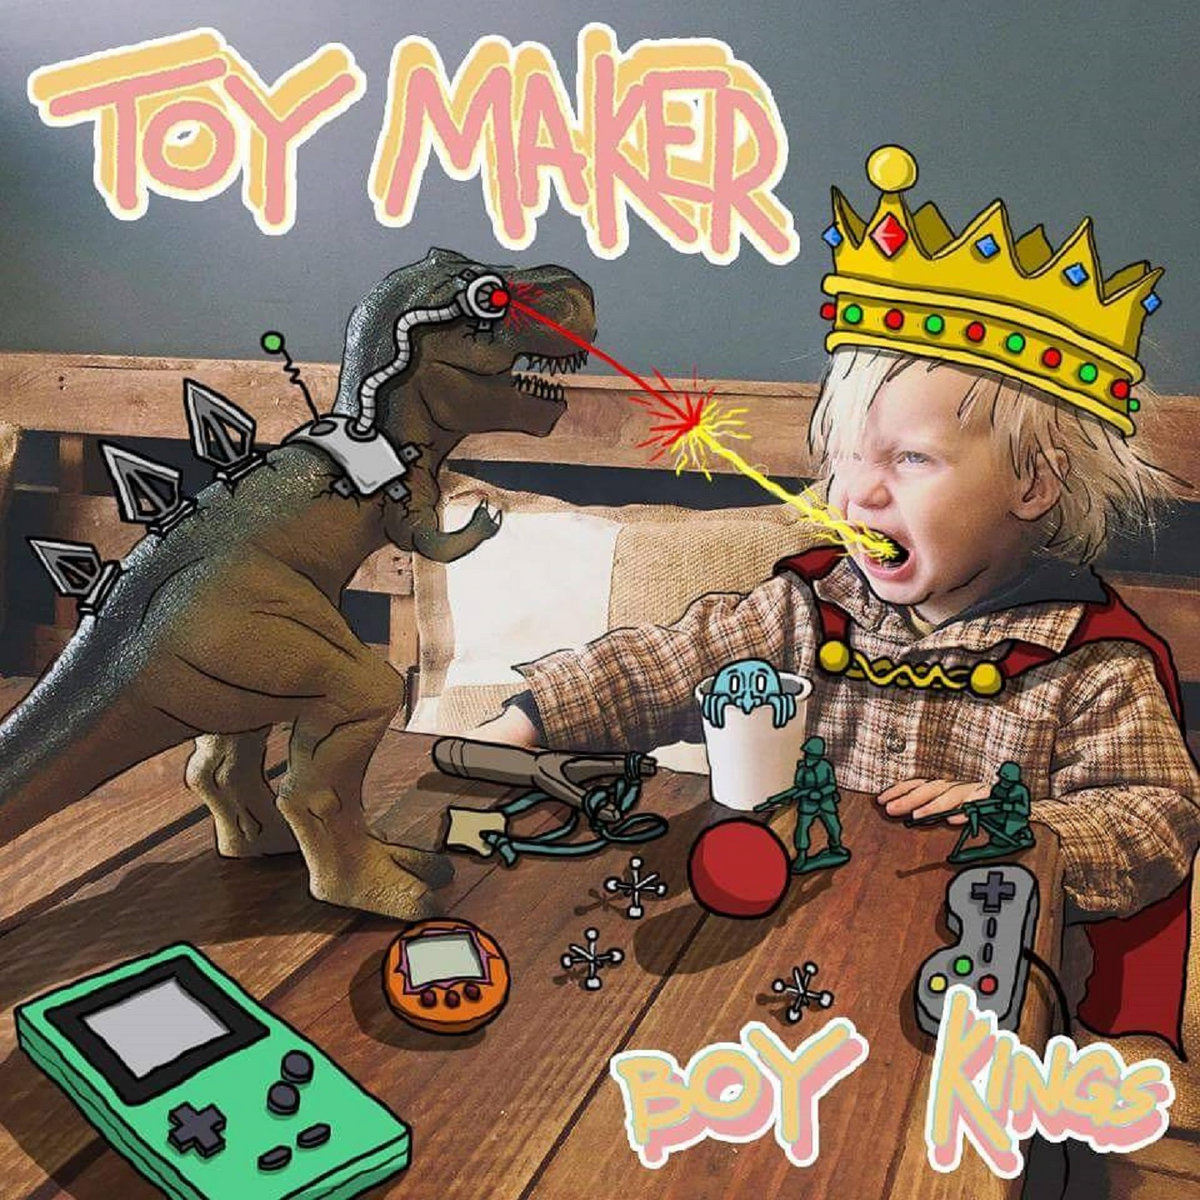 Toy Maker - Boy Kings [EP] (2016)